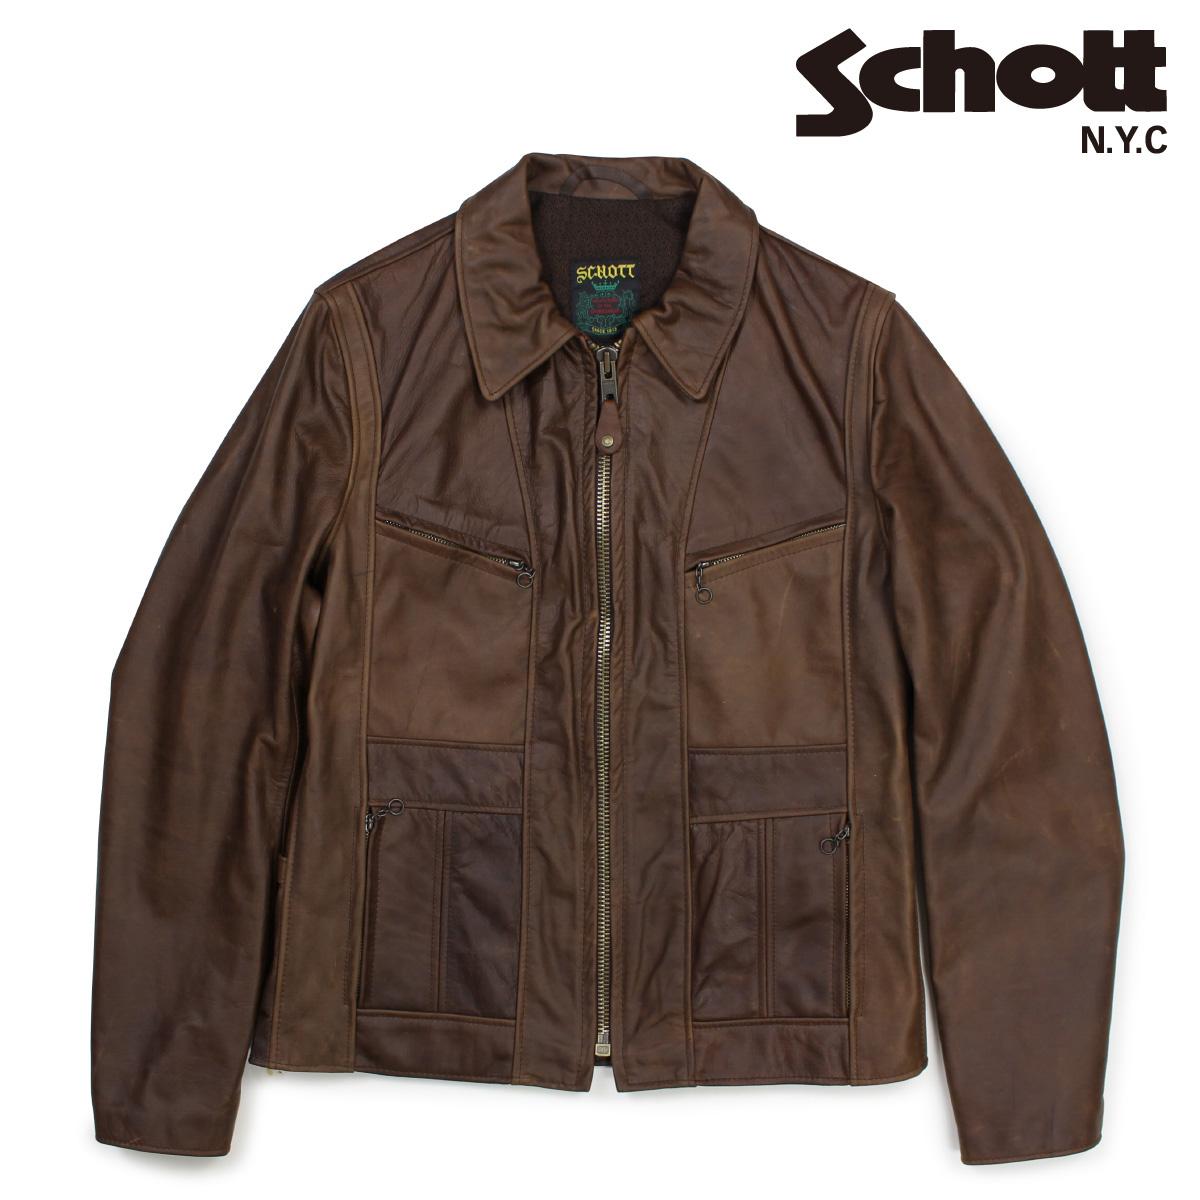 Schott ショット シングルライダースジャケット ジャケット レザージャケット メンズ MOTORCYCLE JACKET ブラウン 502